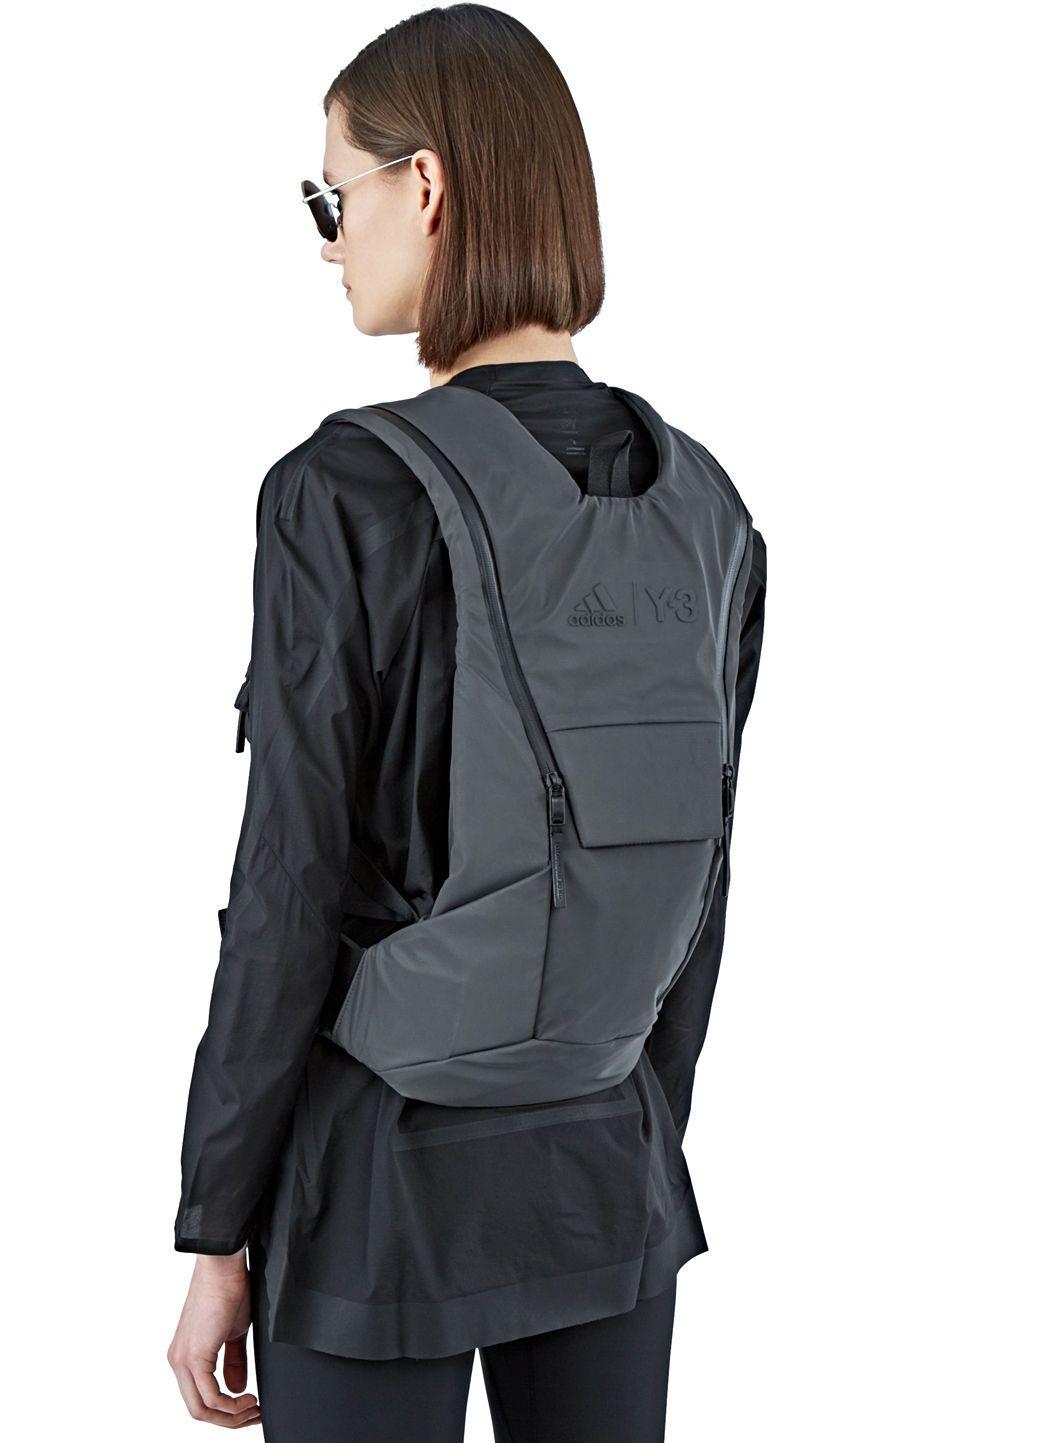 b94bd9cd551a Men s Backpacks - Bags